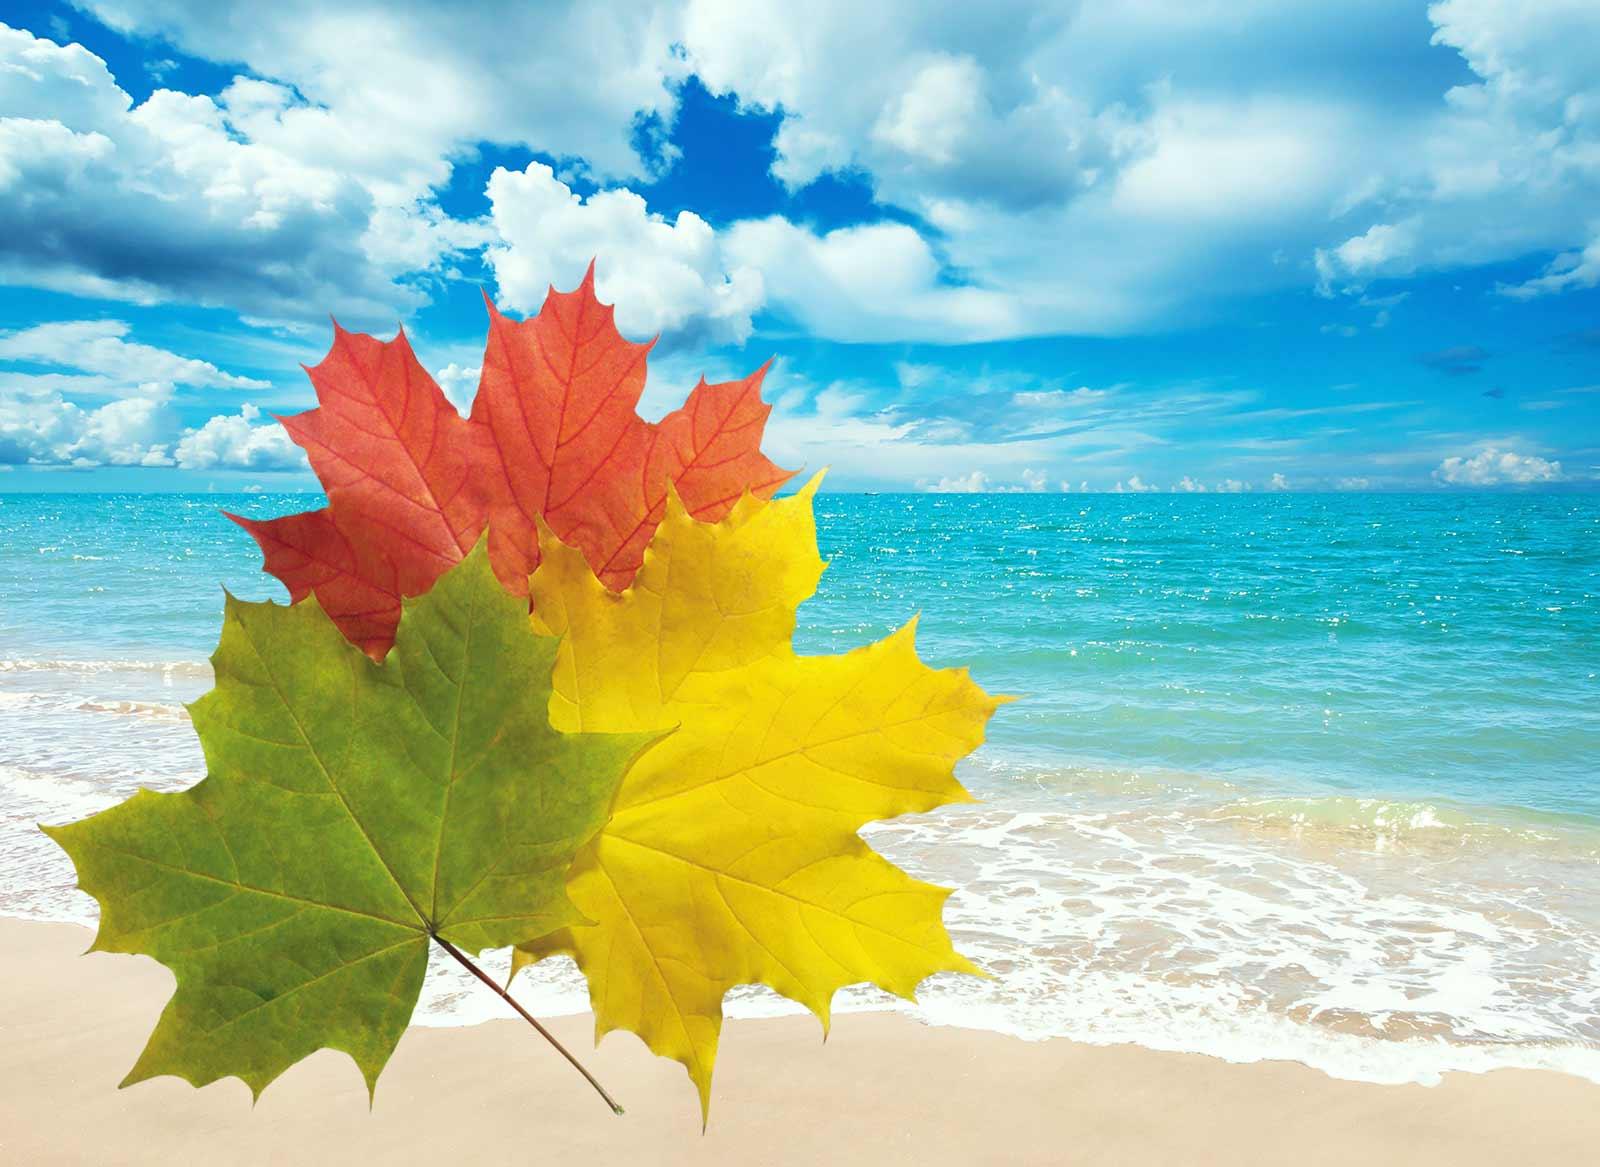 открытки осень и море яндексе народ просто